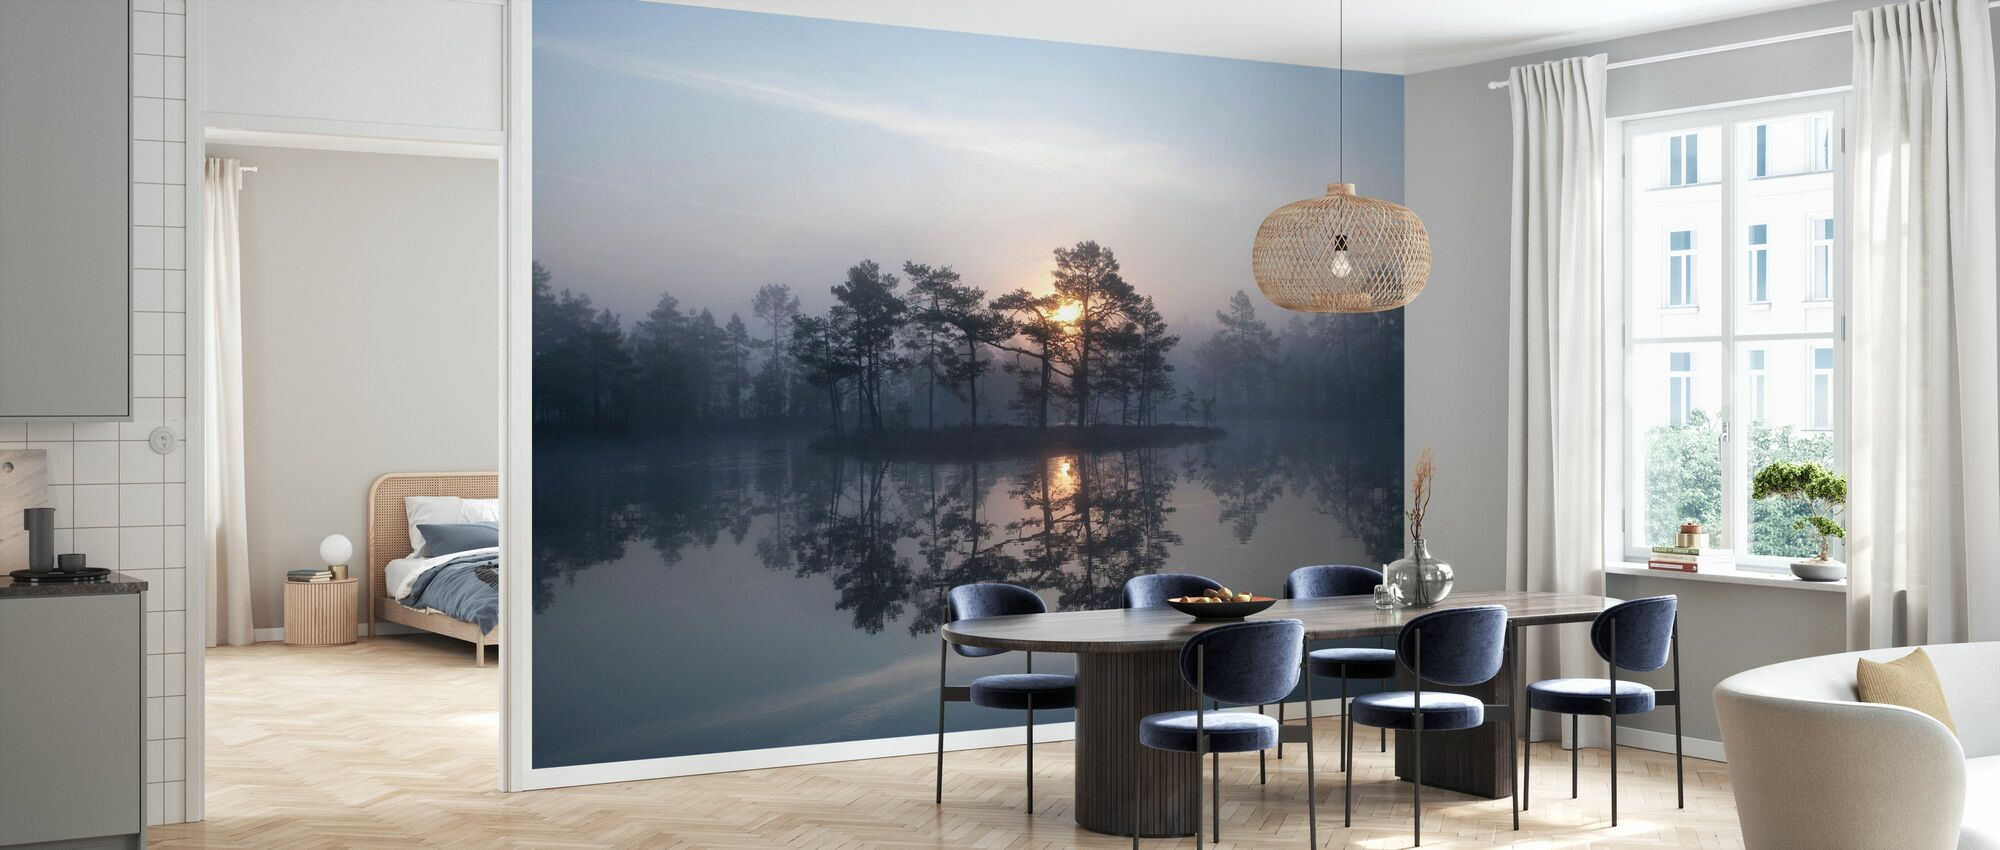 Enchanting Mist - Wallpaper - Kitchen